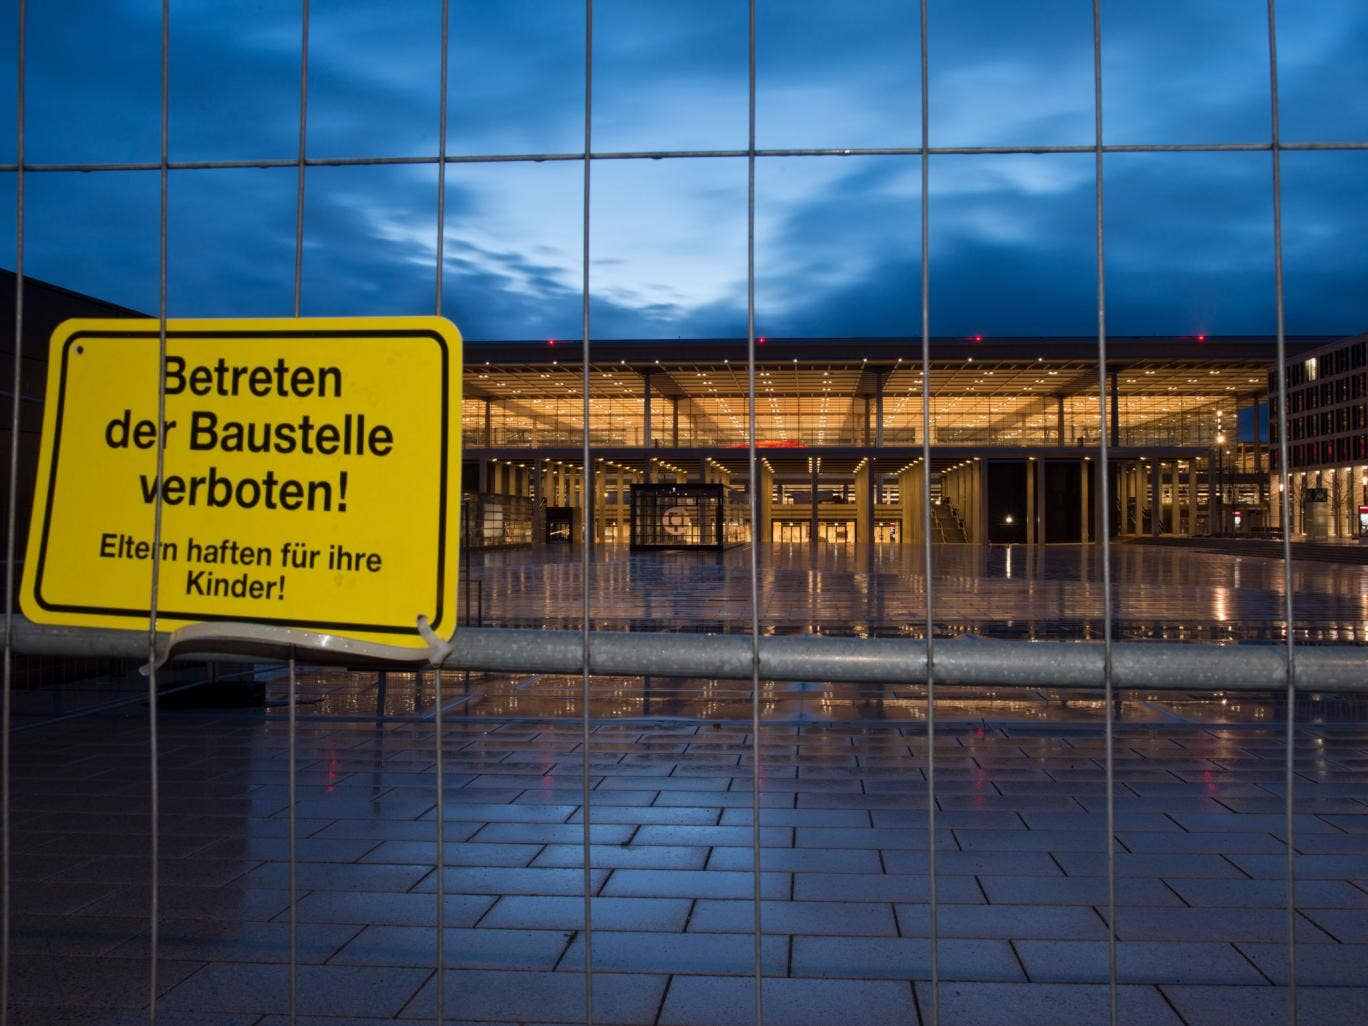 Berlin Brandenburg Willy Brandt airport's lights never shut off